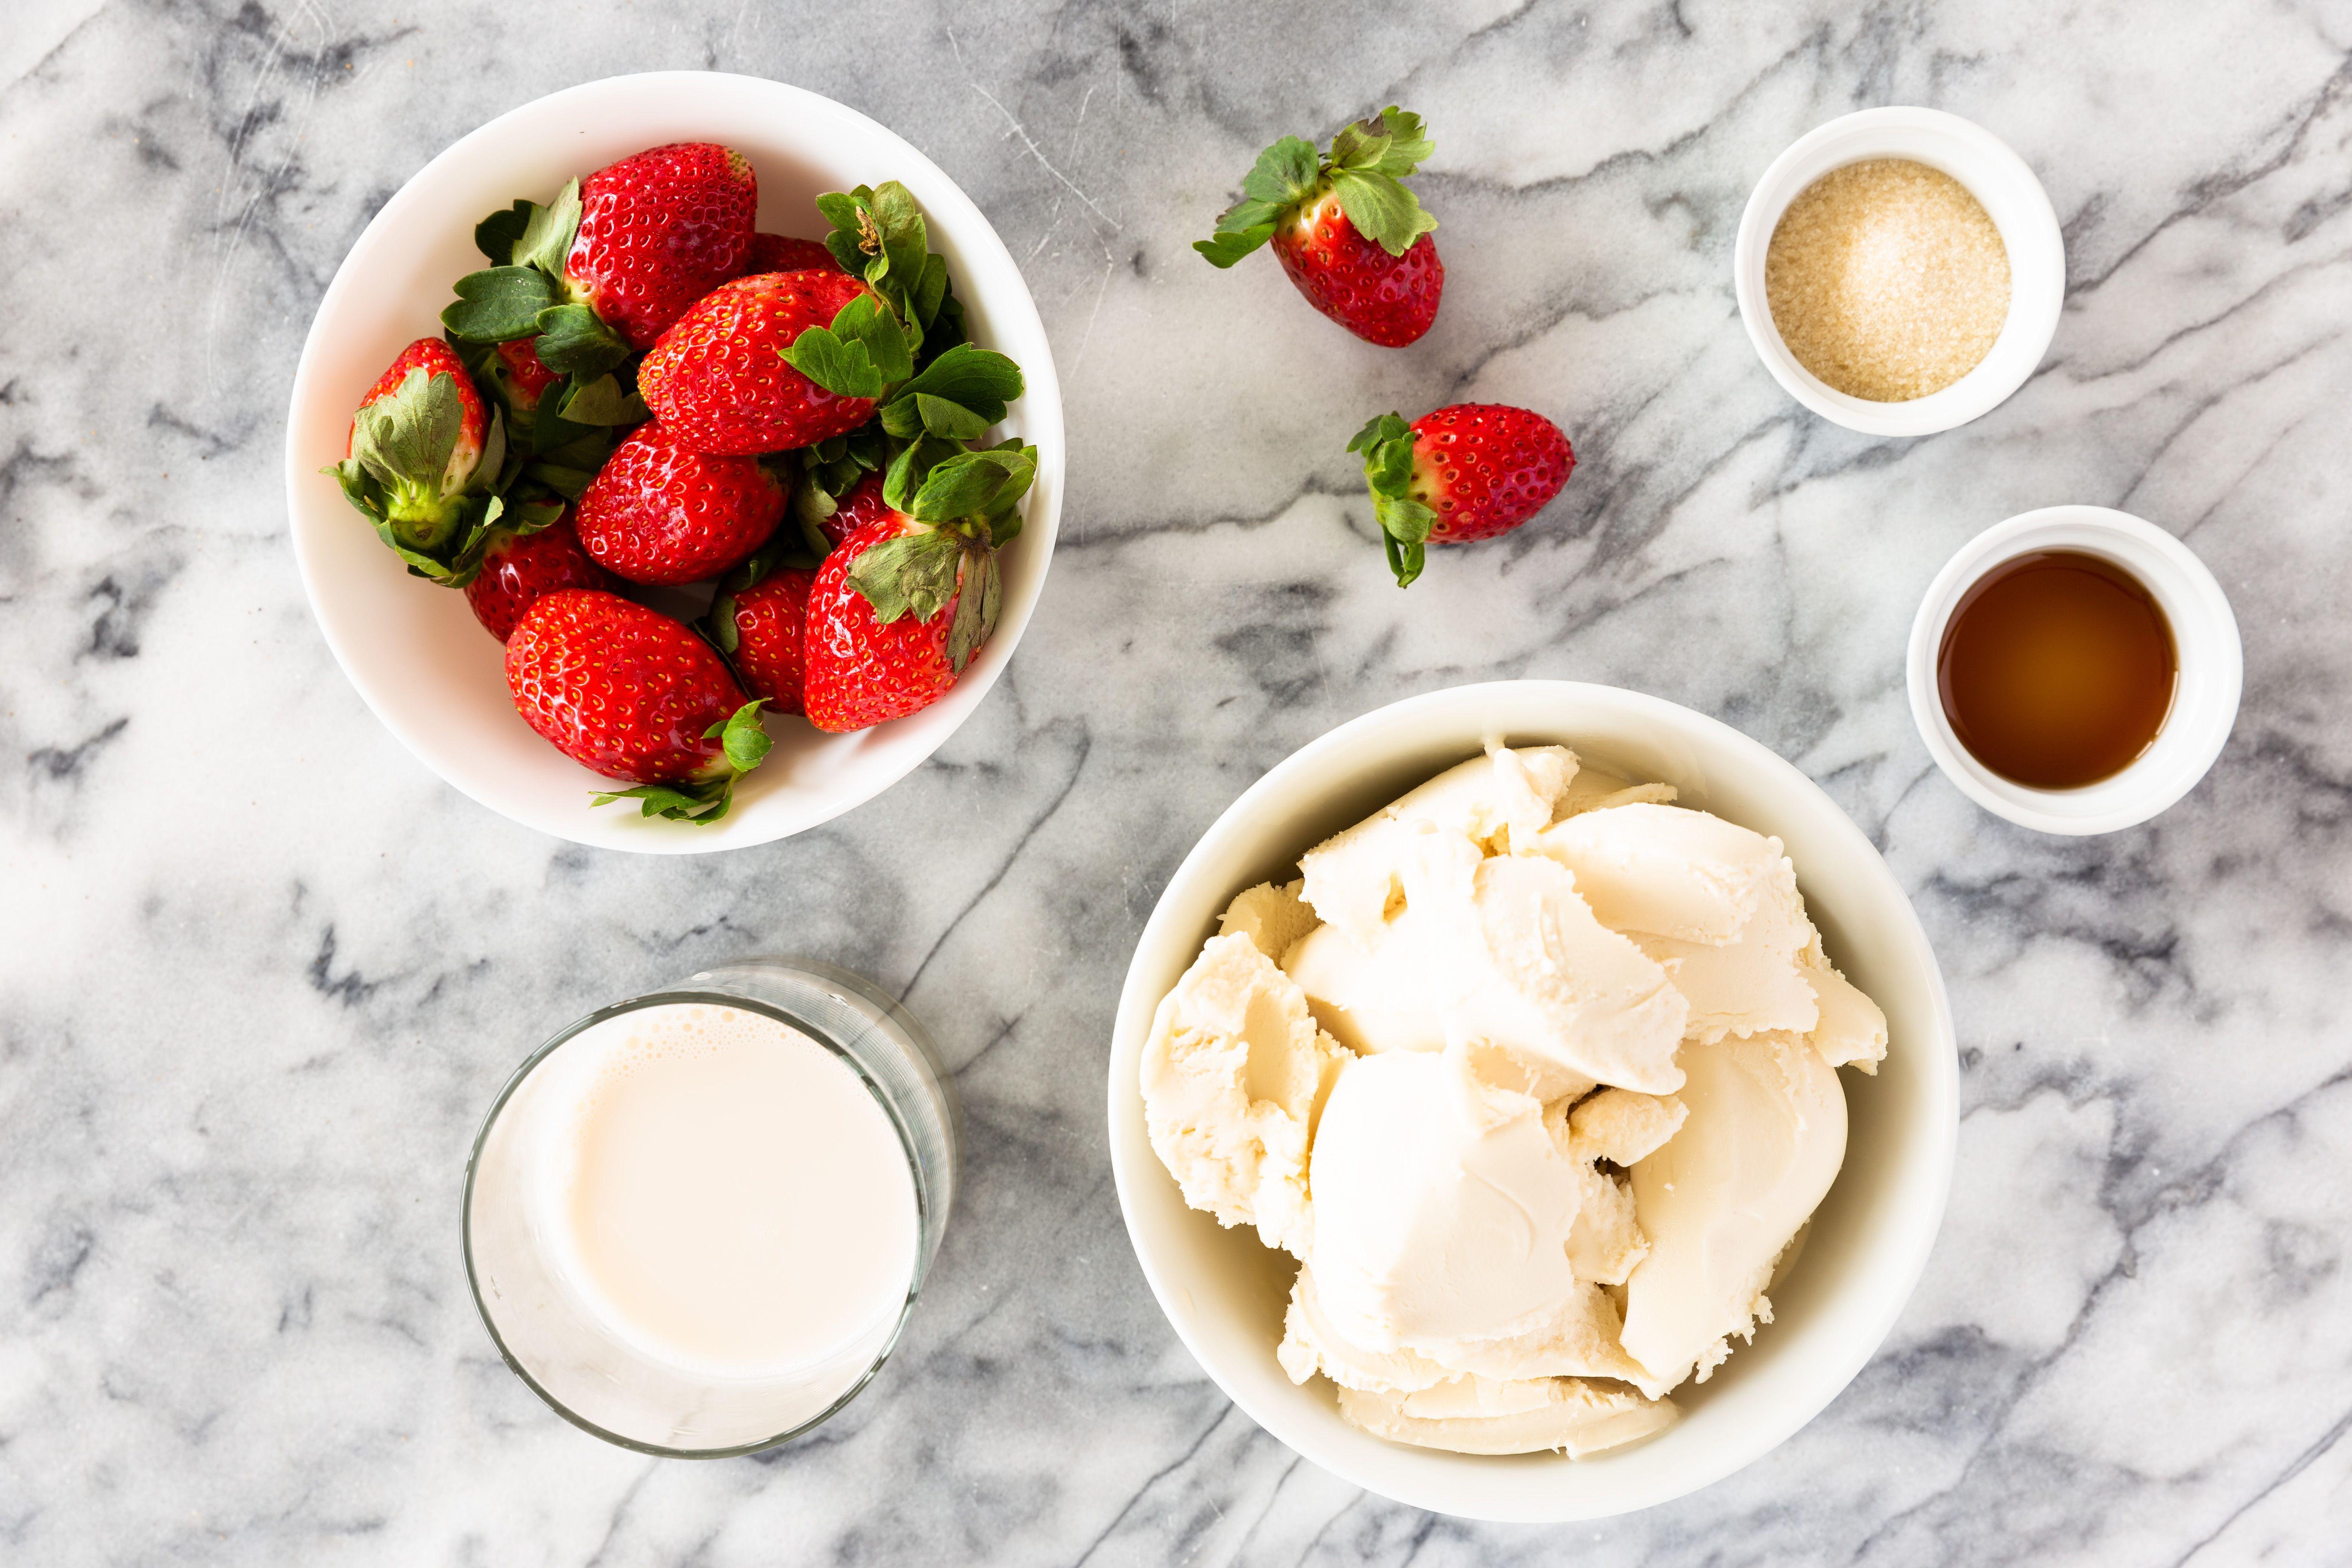 Ingredients for a strawberry milkshake